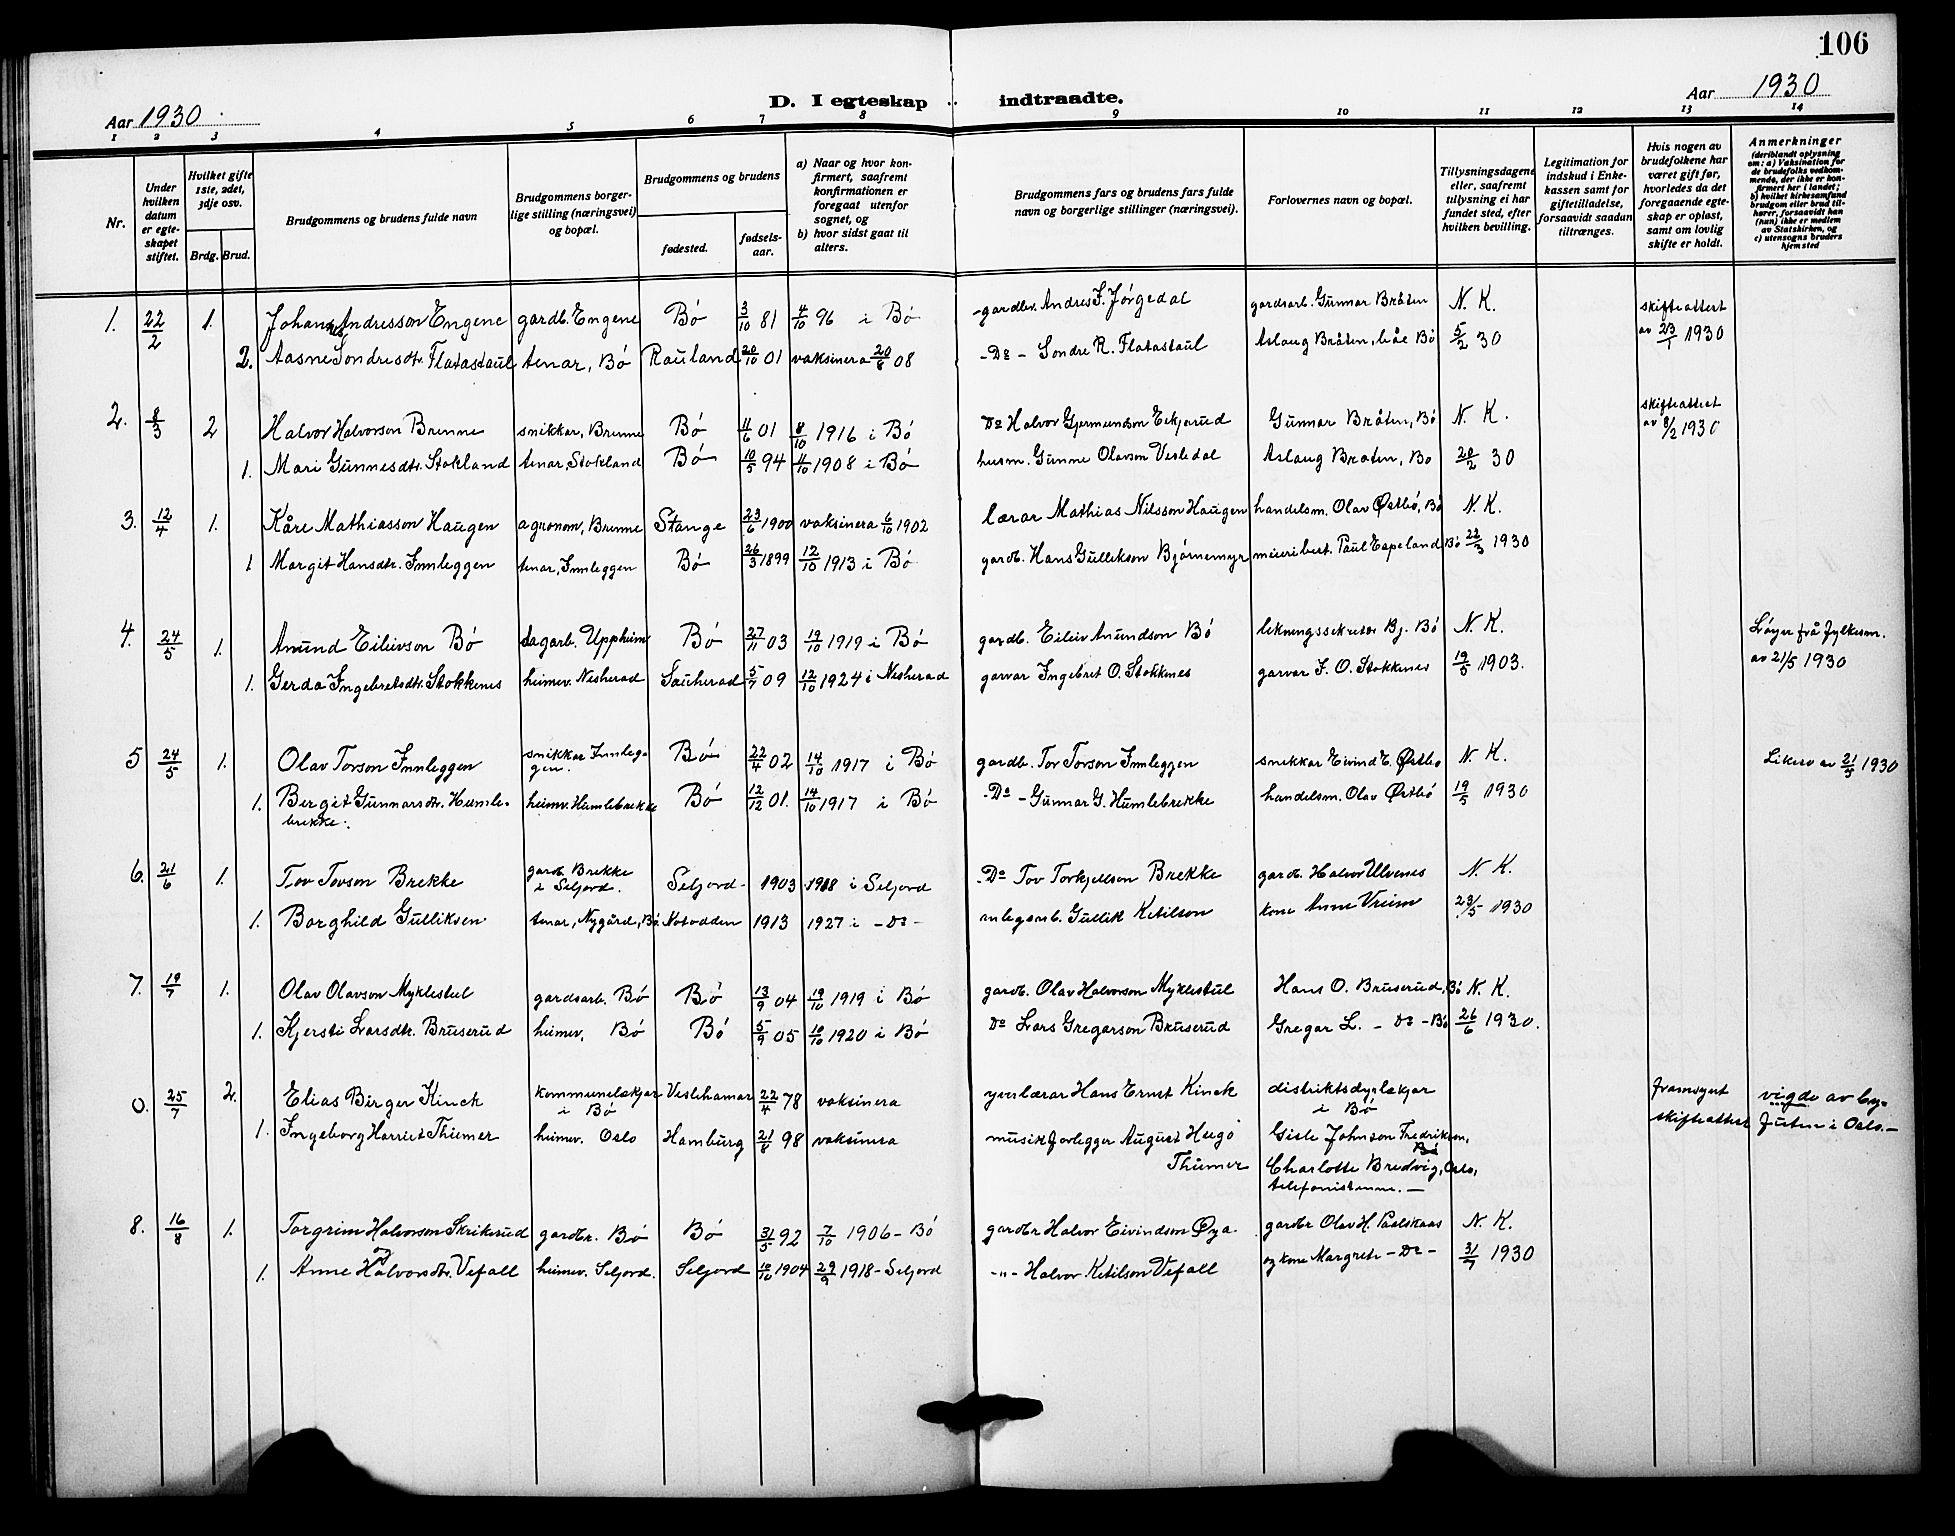 SAKO, Bø kirkebøker, G/Ga/L0008: Klokkerbok nr. 8, 1920-1930, s. 106